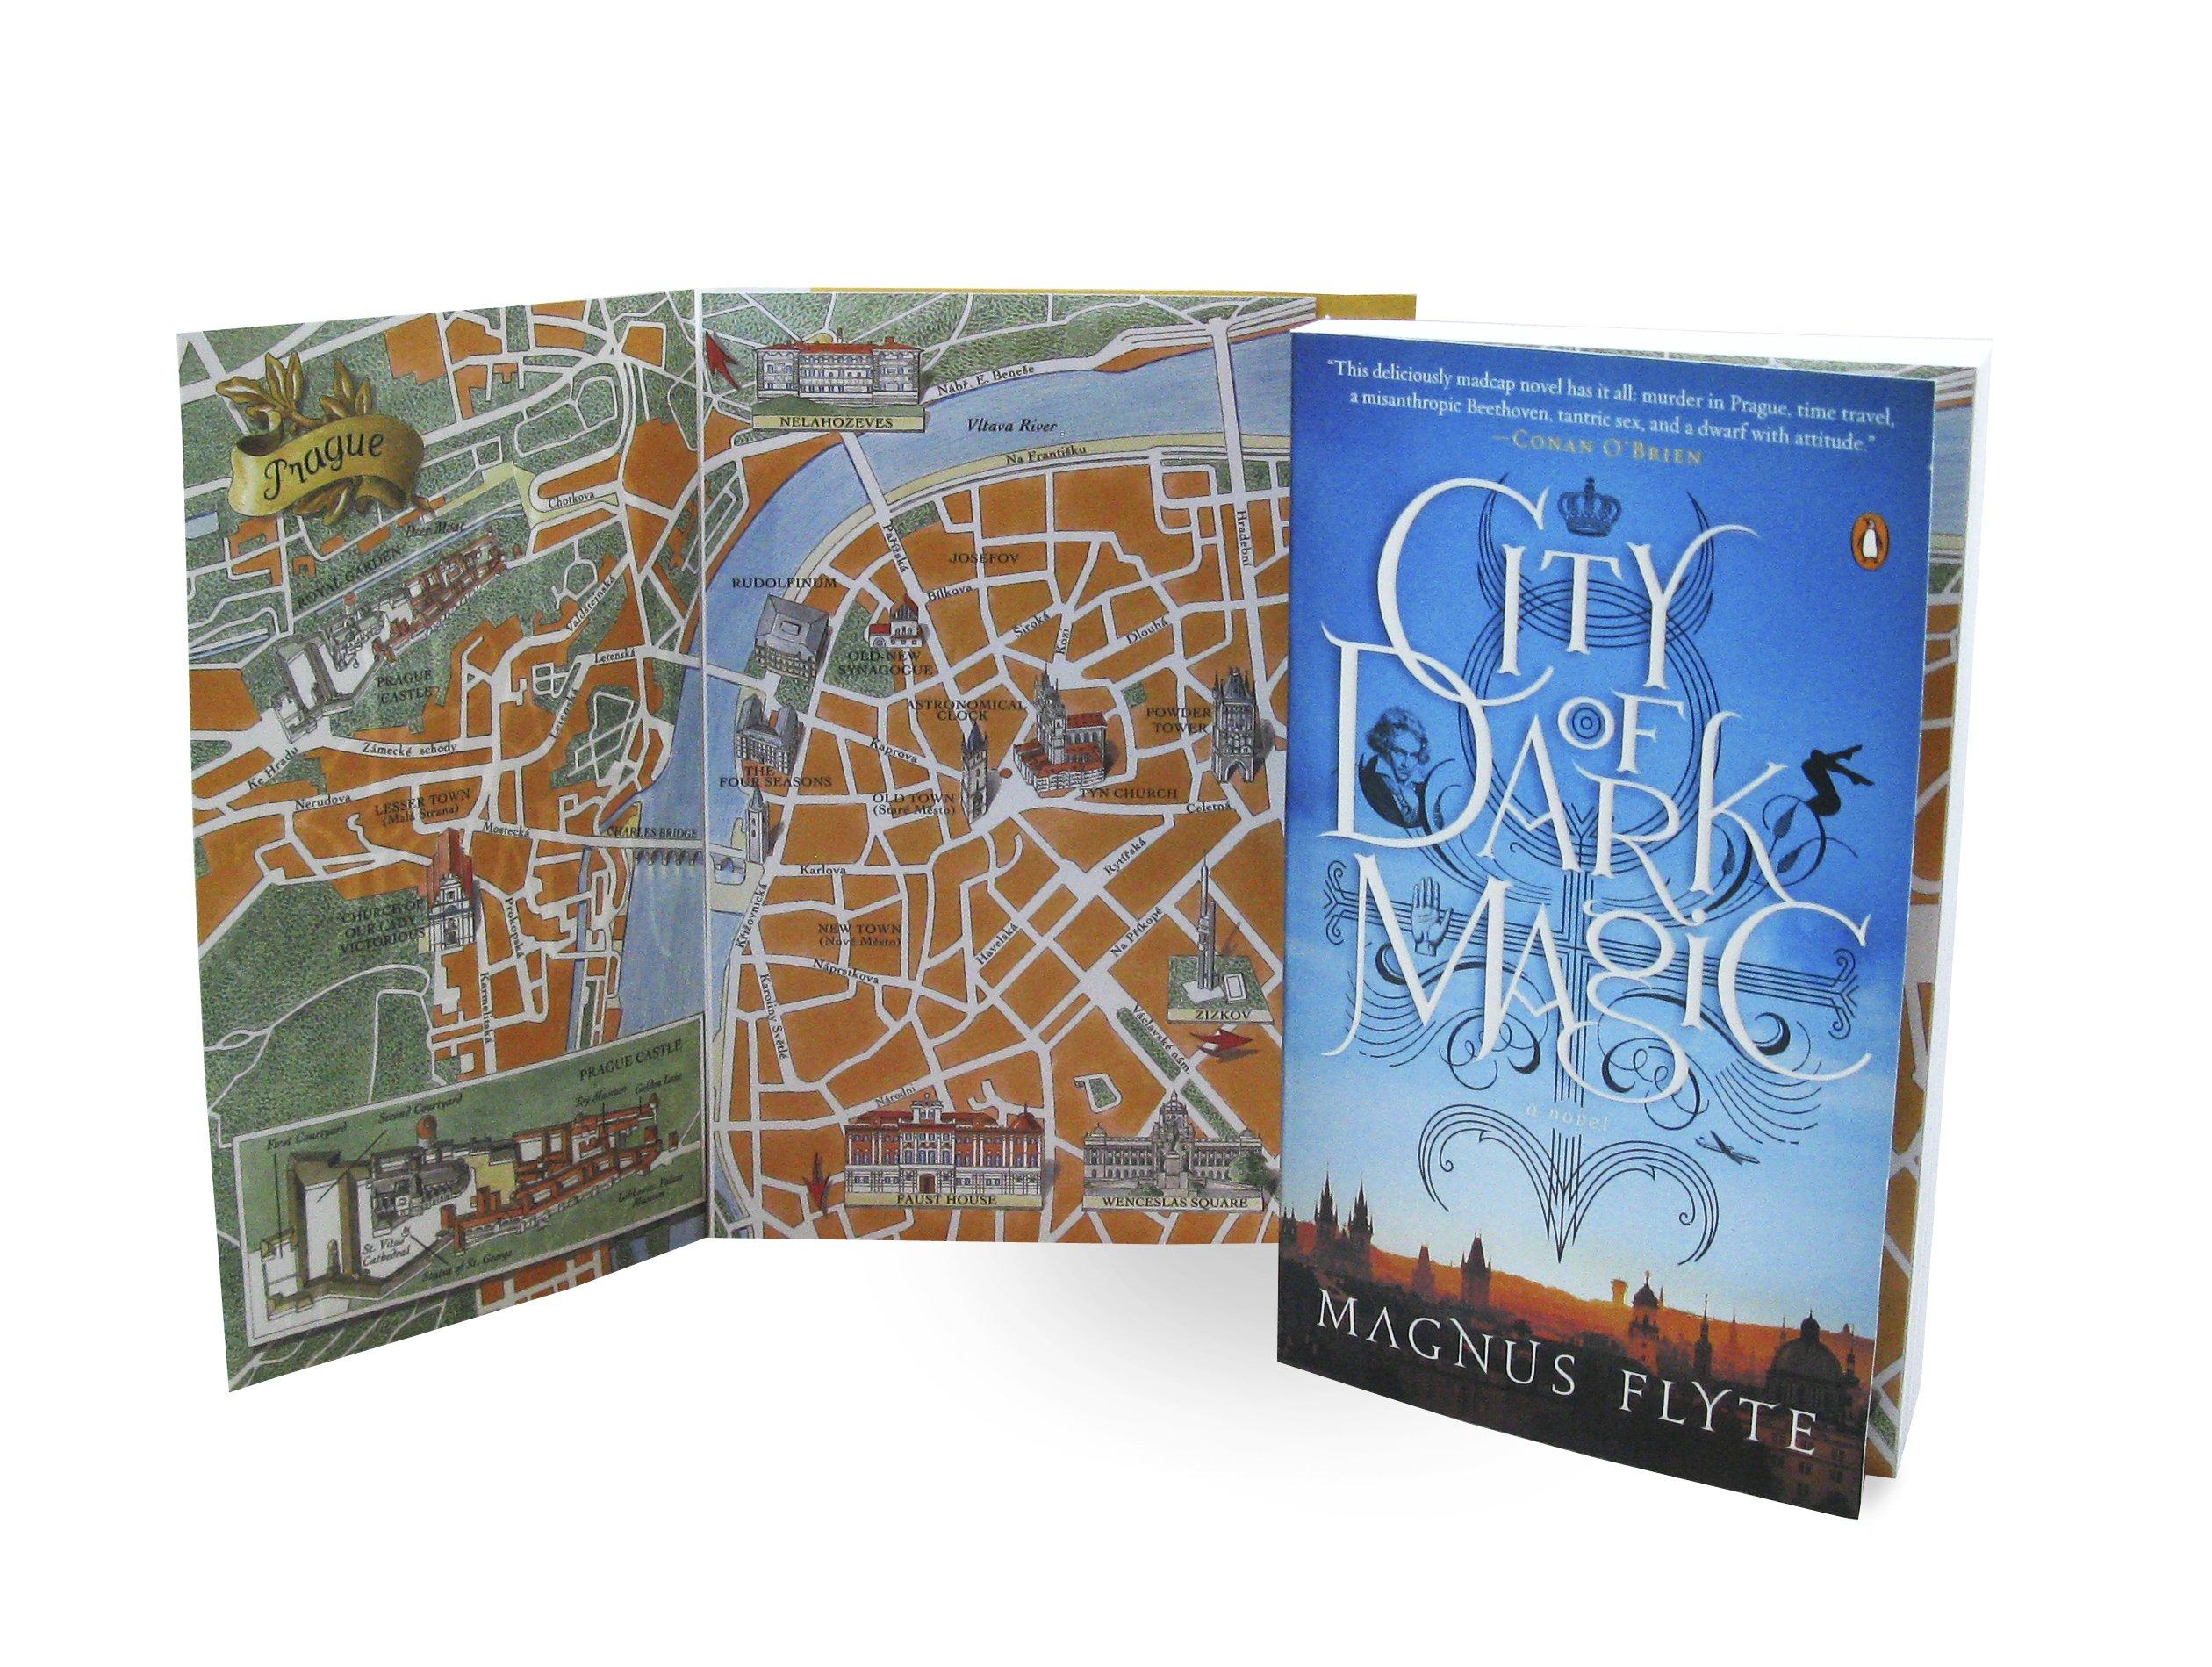 City Of Dark Magic: A Novel: Magnus Flyte: 9780143122685: Amazon: Books